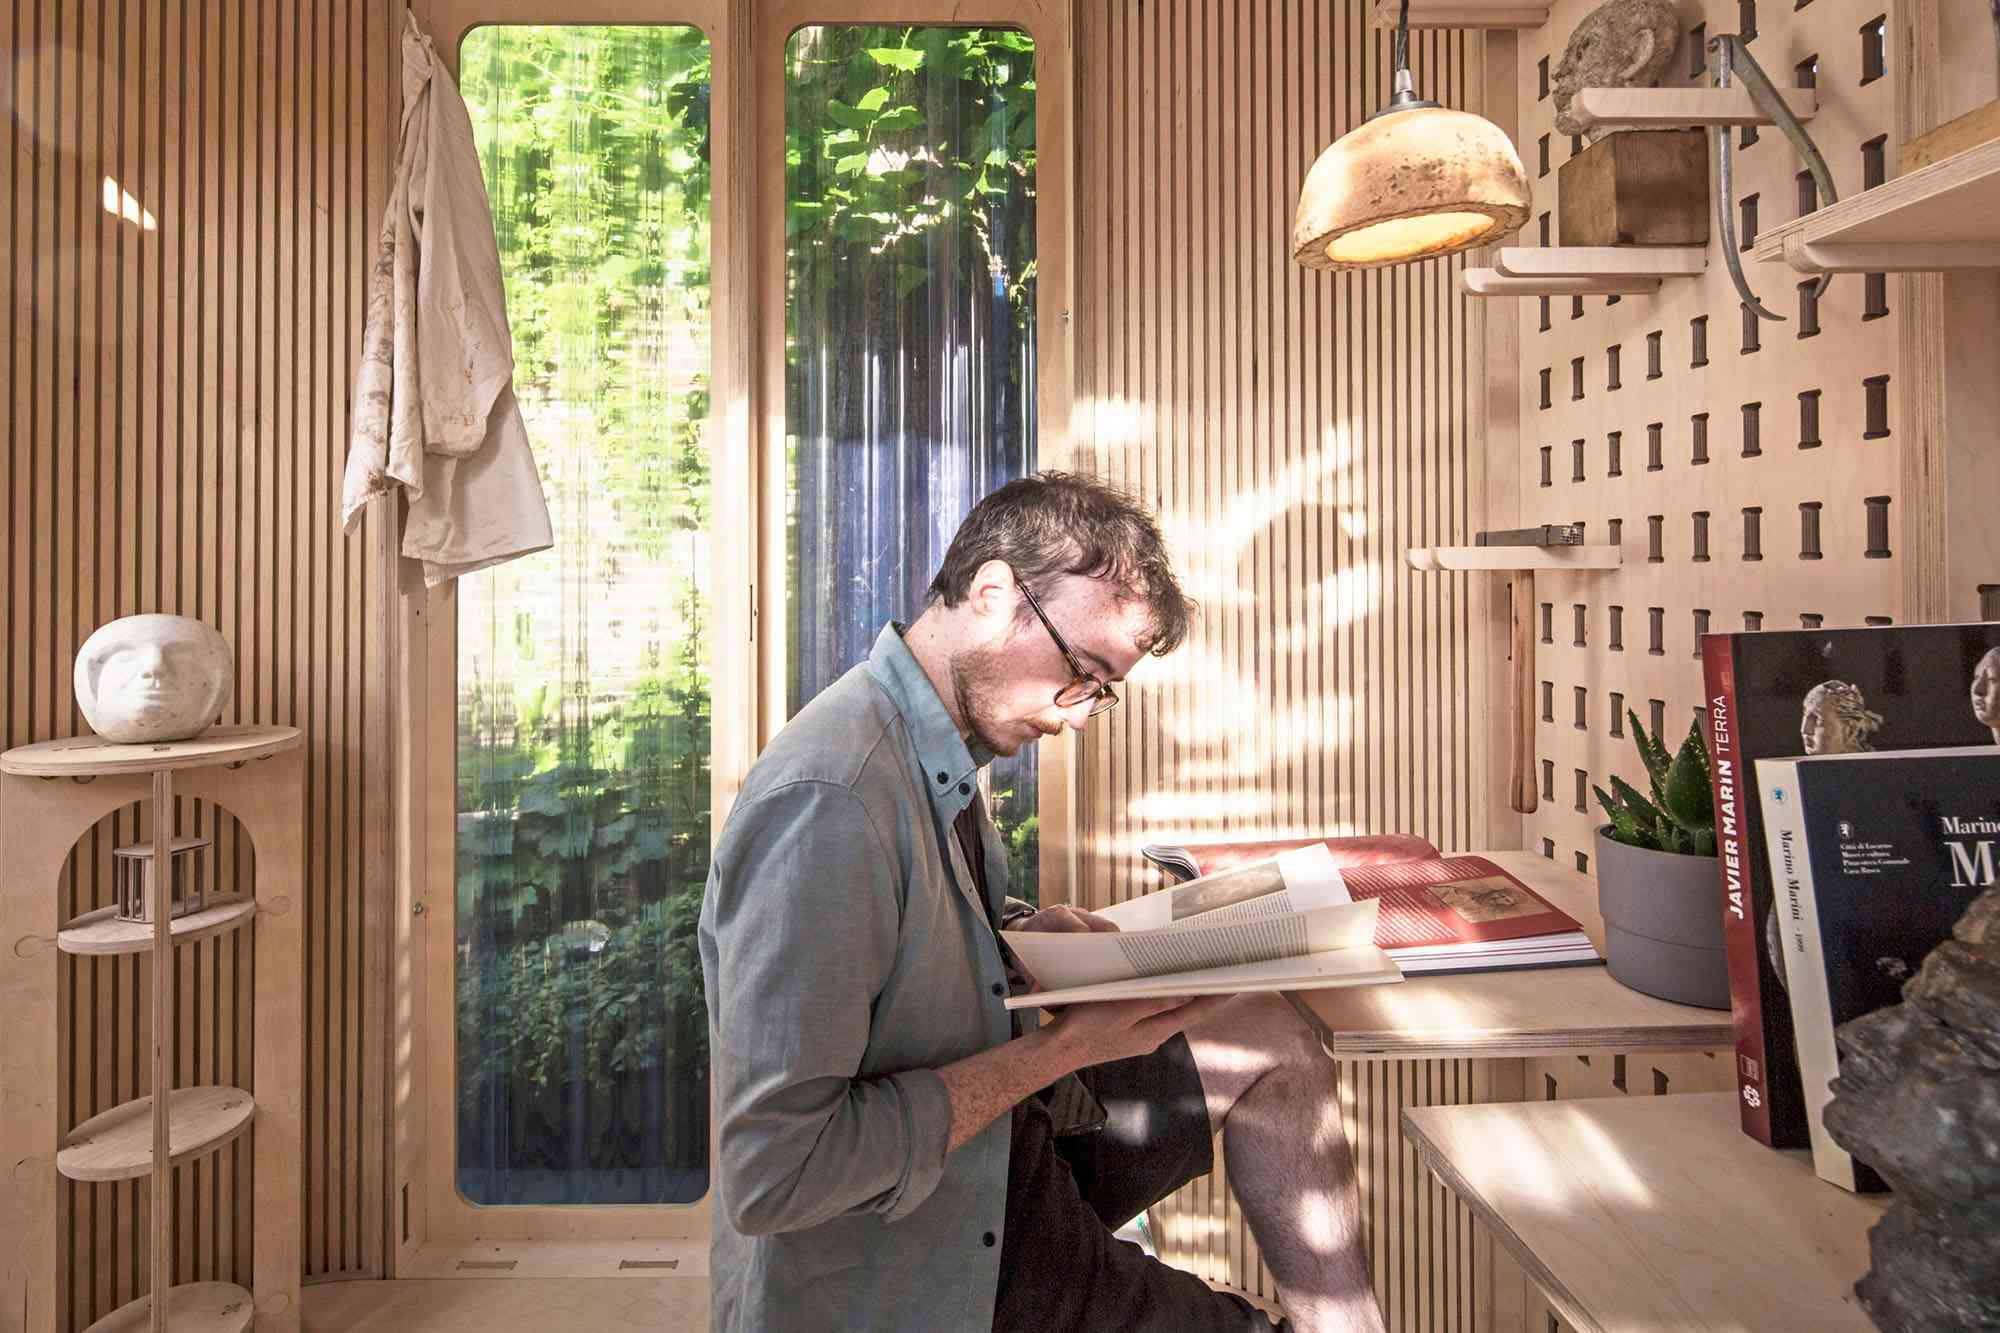 My Room In The Garden prefab home office module Boano Prišmontas interior work space made of wood